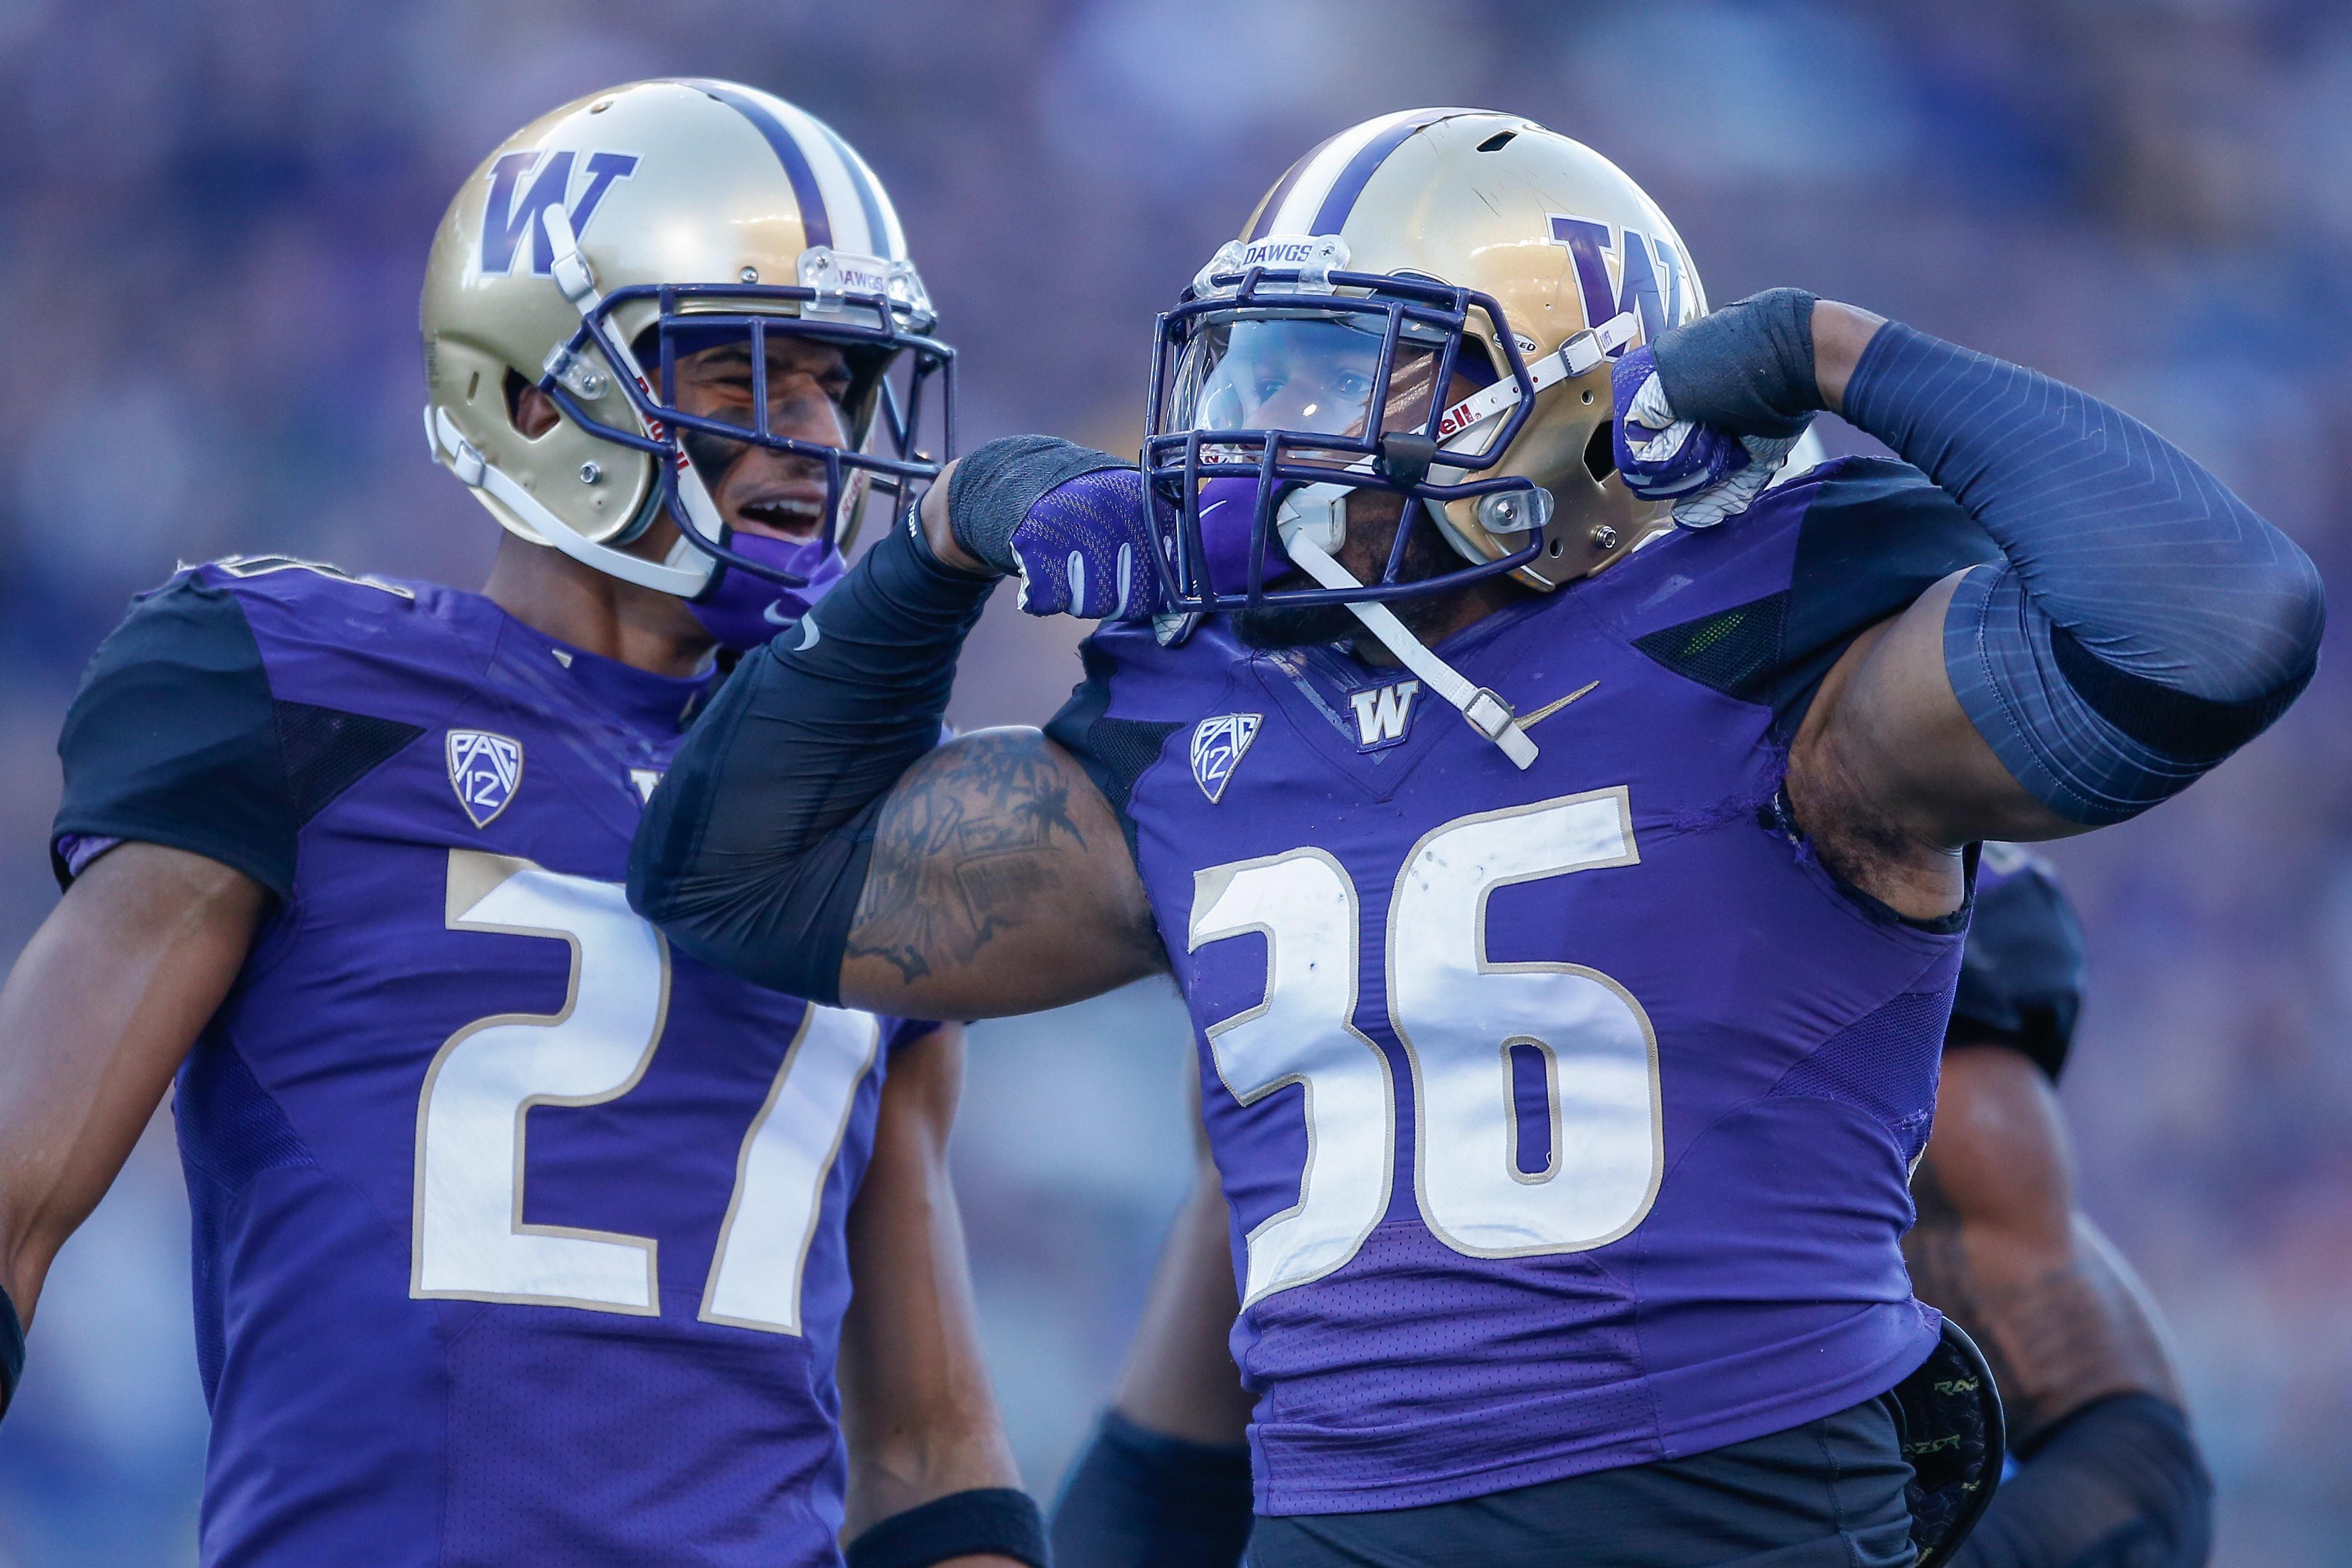 Azeem Victor Washington Huskies Football Jersey - Purple